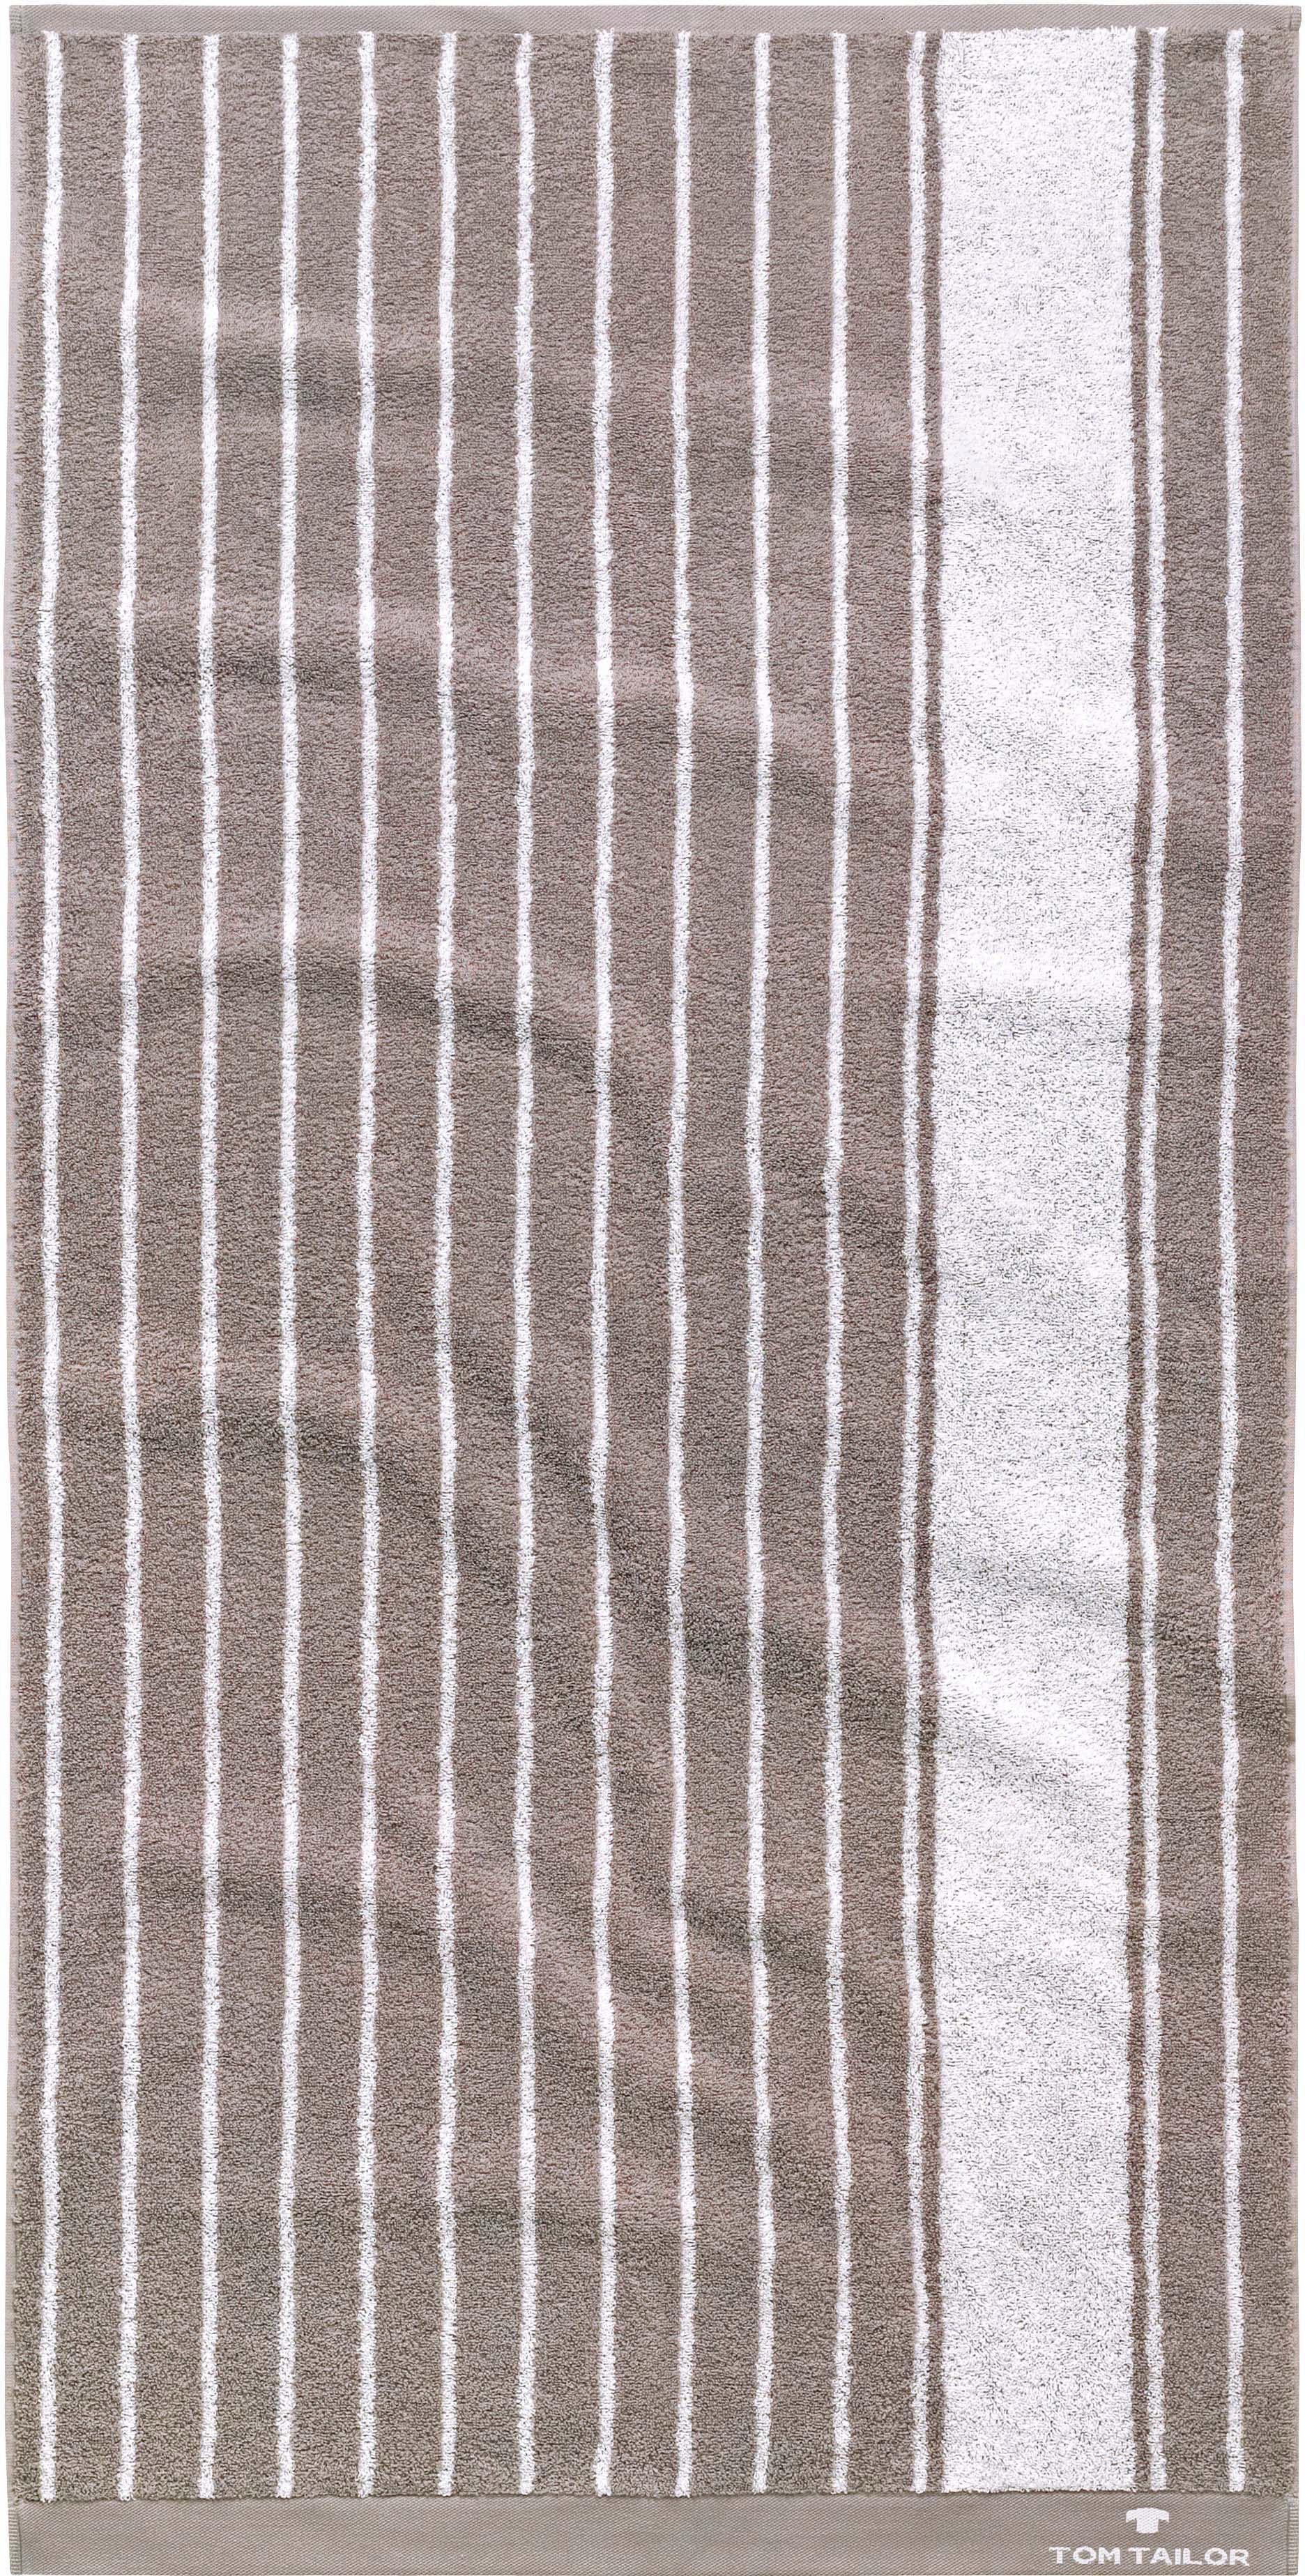 Badetuch Tom Tailor Navy Stripes mit maritimen Muster